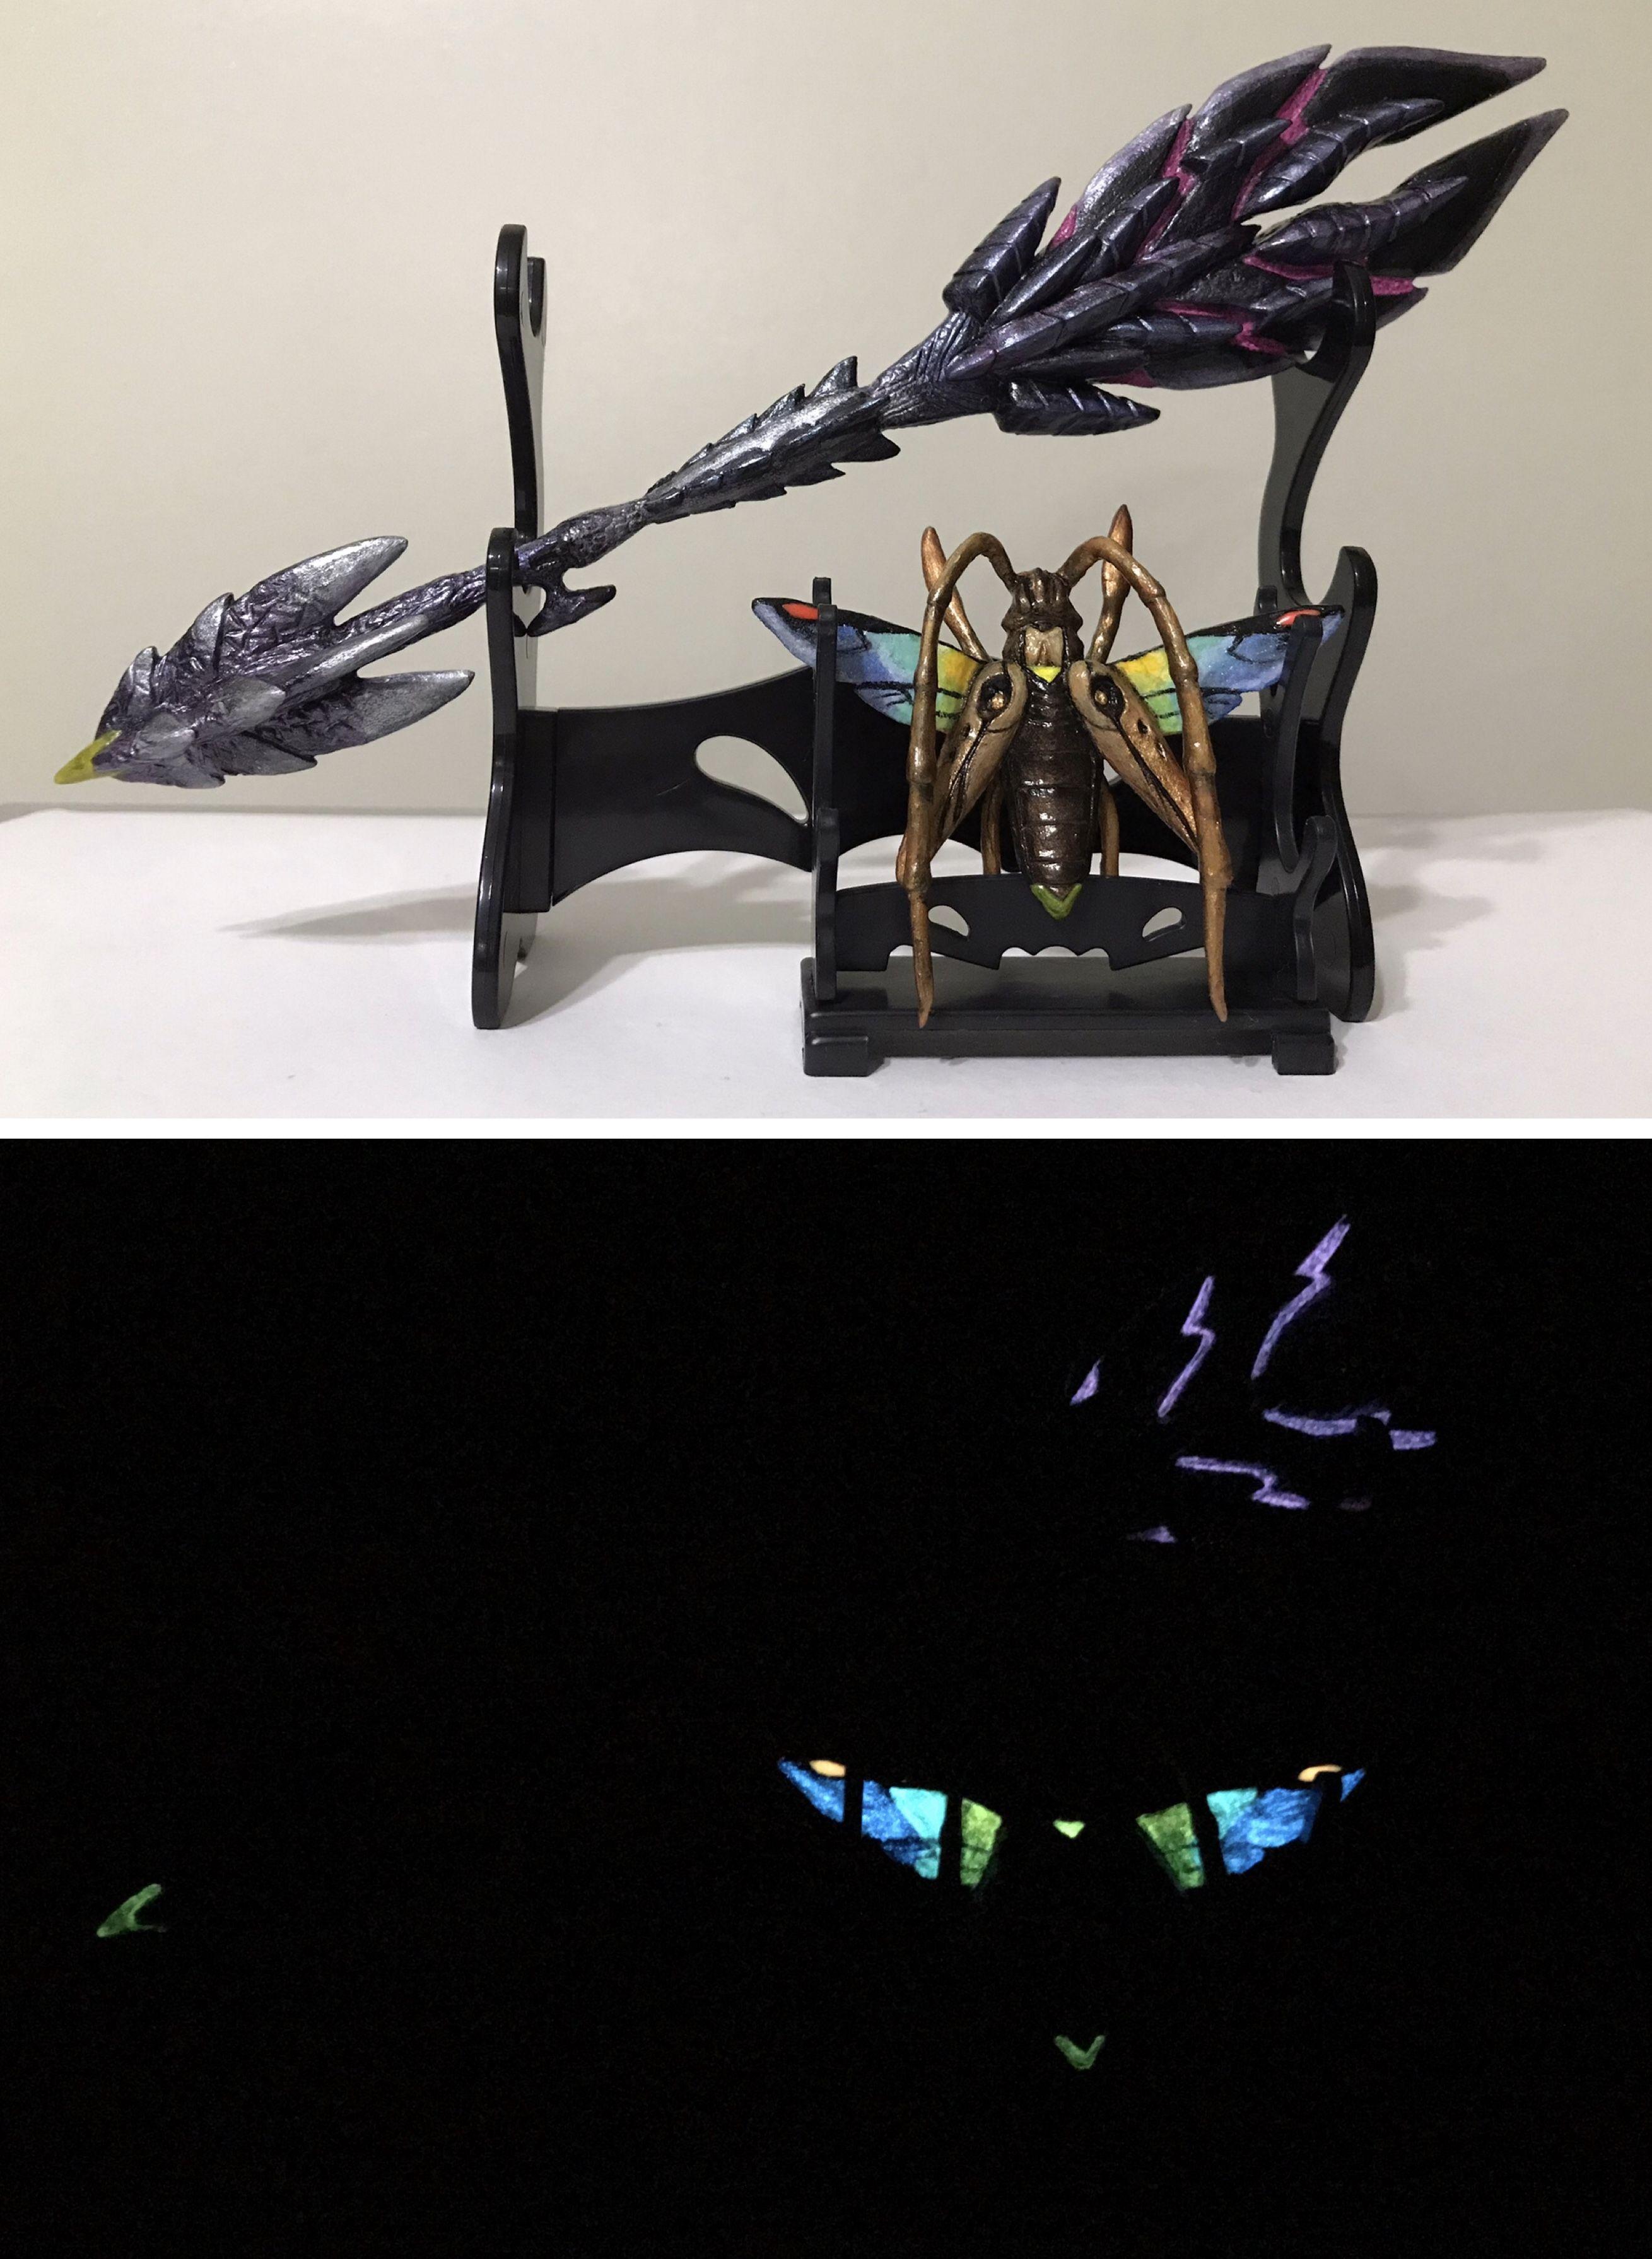 Alatreon Godslayer Alatreon Insect Glaive Monster Hunter World